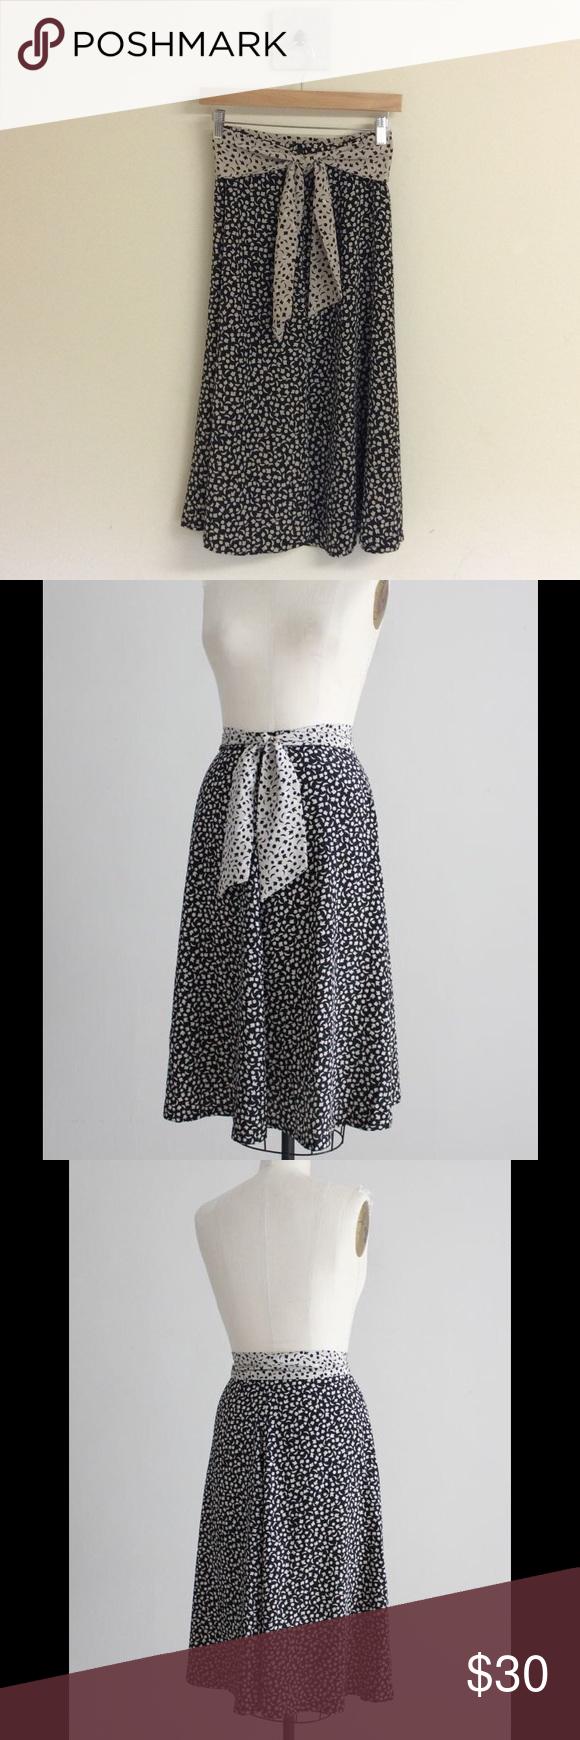 70s Polka Dot Skirt Cotton Midi Skirt 26 Waist Small Vintage Skirt